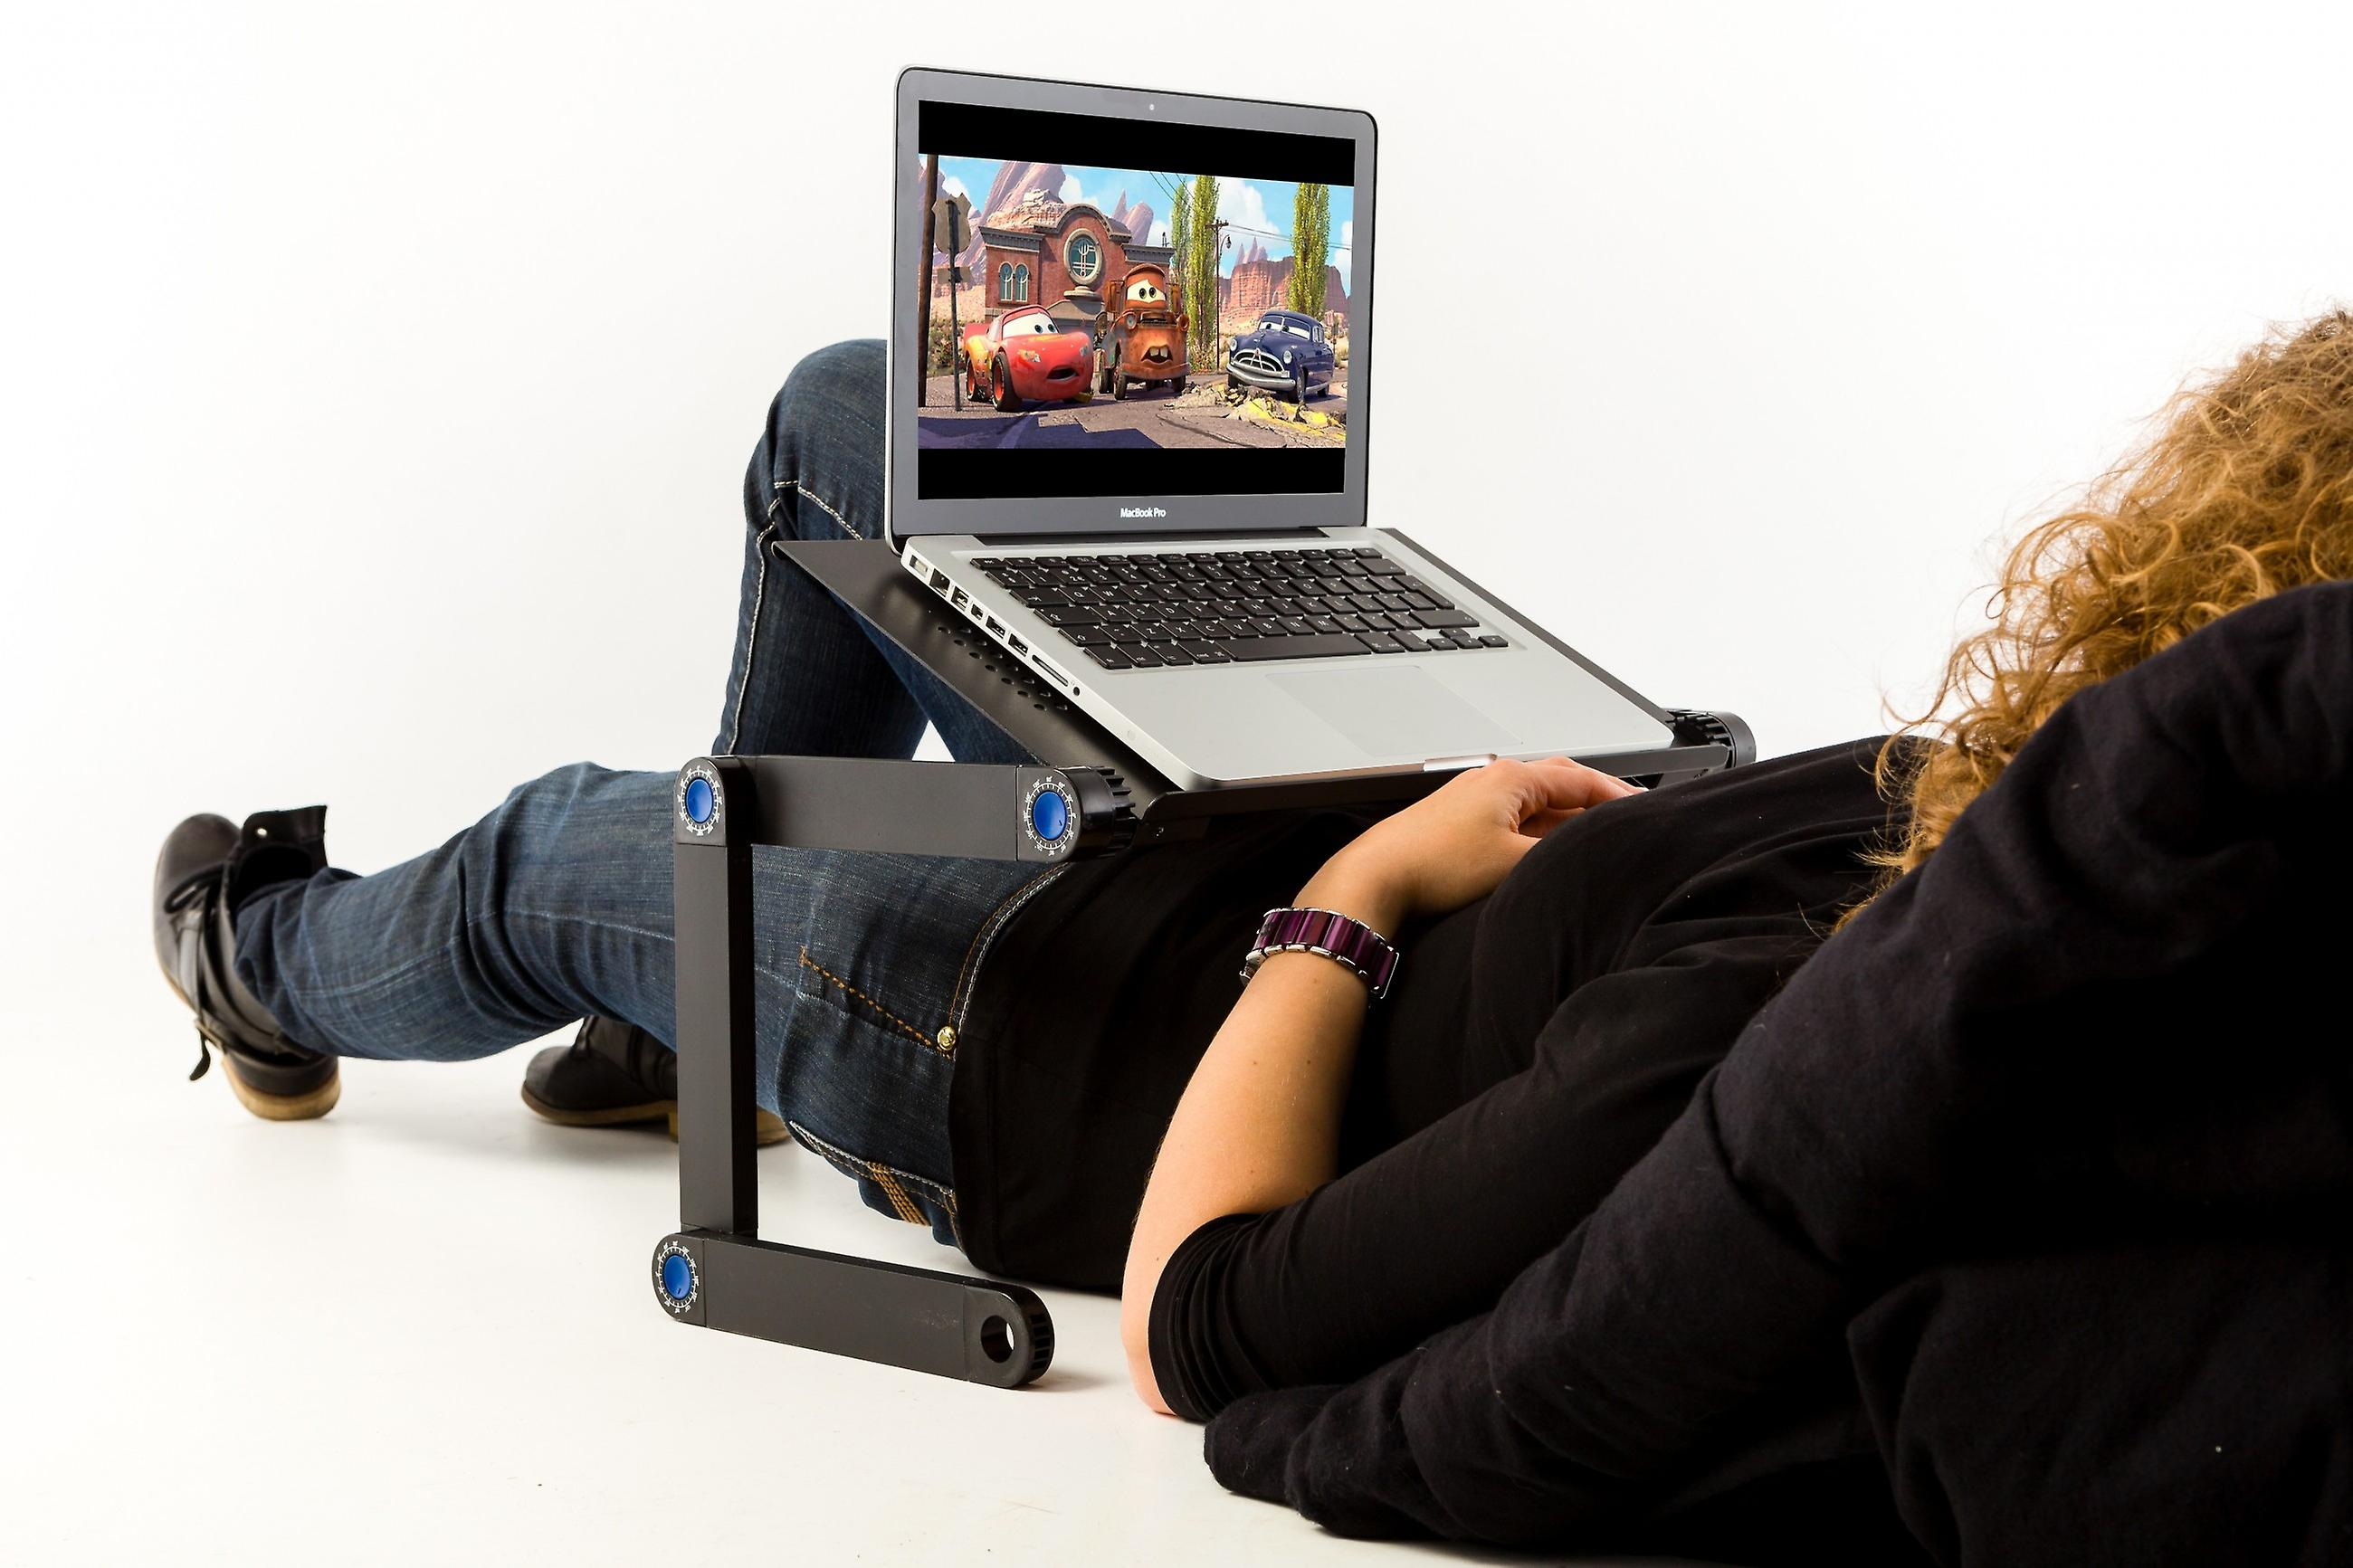 TECHNOSMART laptop stand foldable, height-adjustable laptop table for ergonomic work, comfortable handling for bed, sofa, black, 54 x 27 x 5 cm